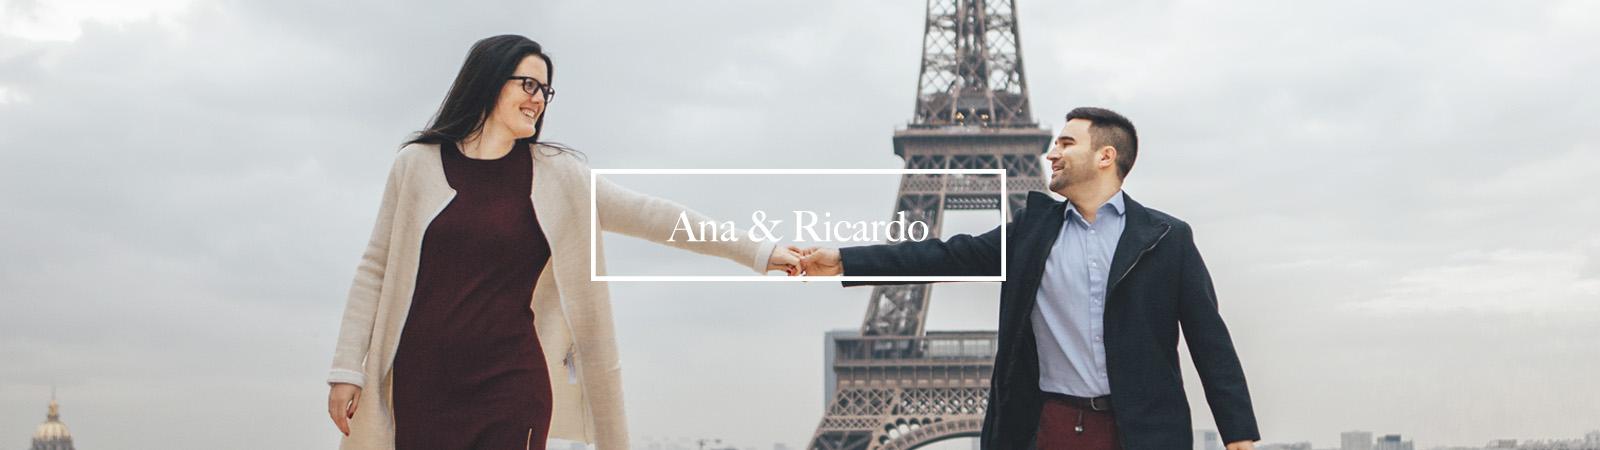 Capa Blog Ana Ricardo